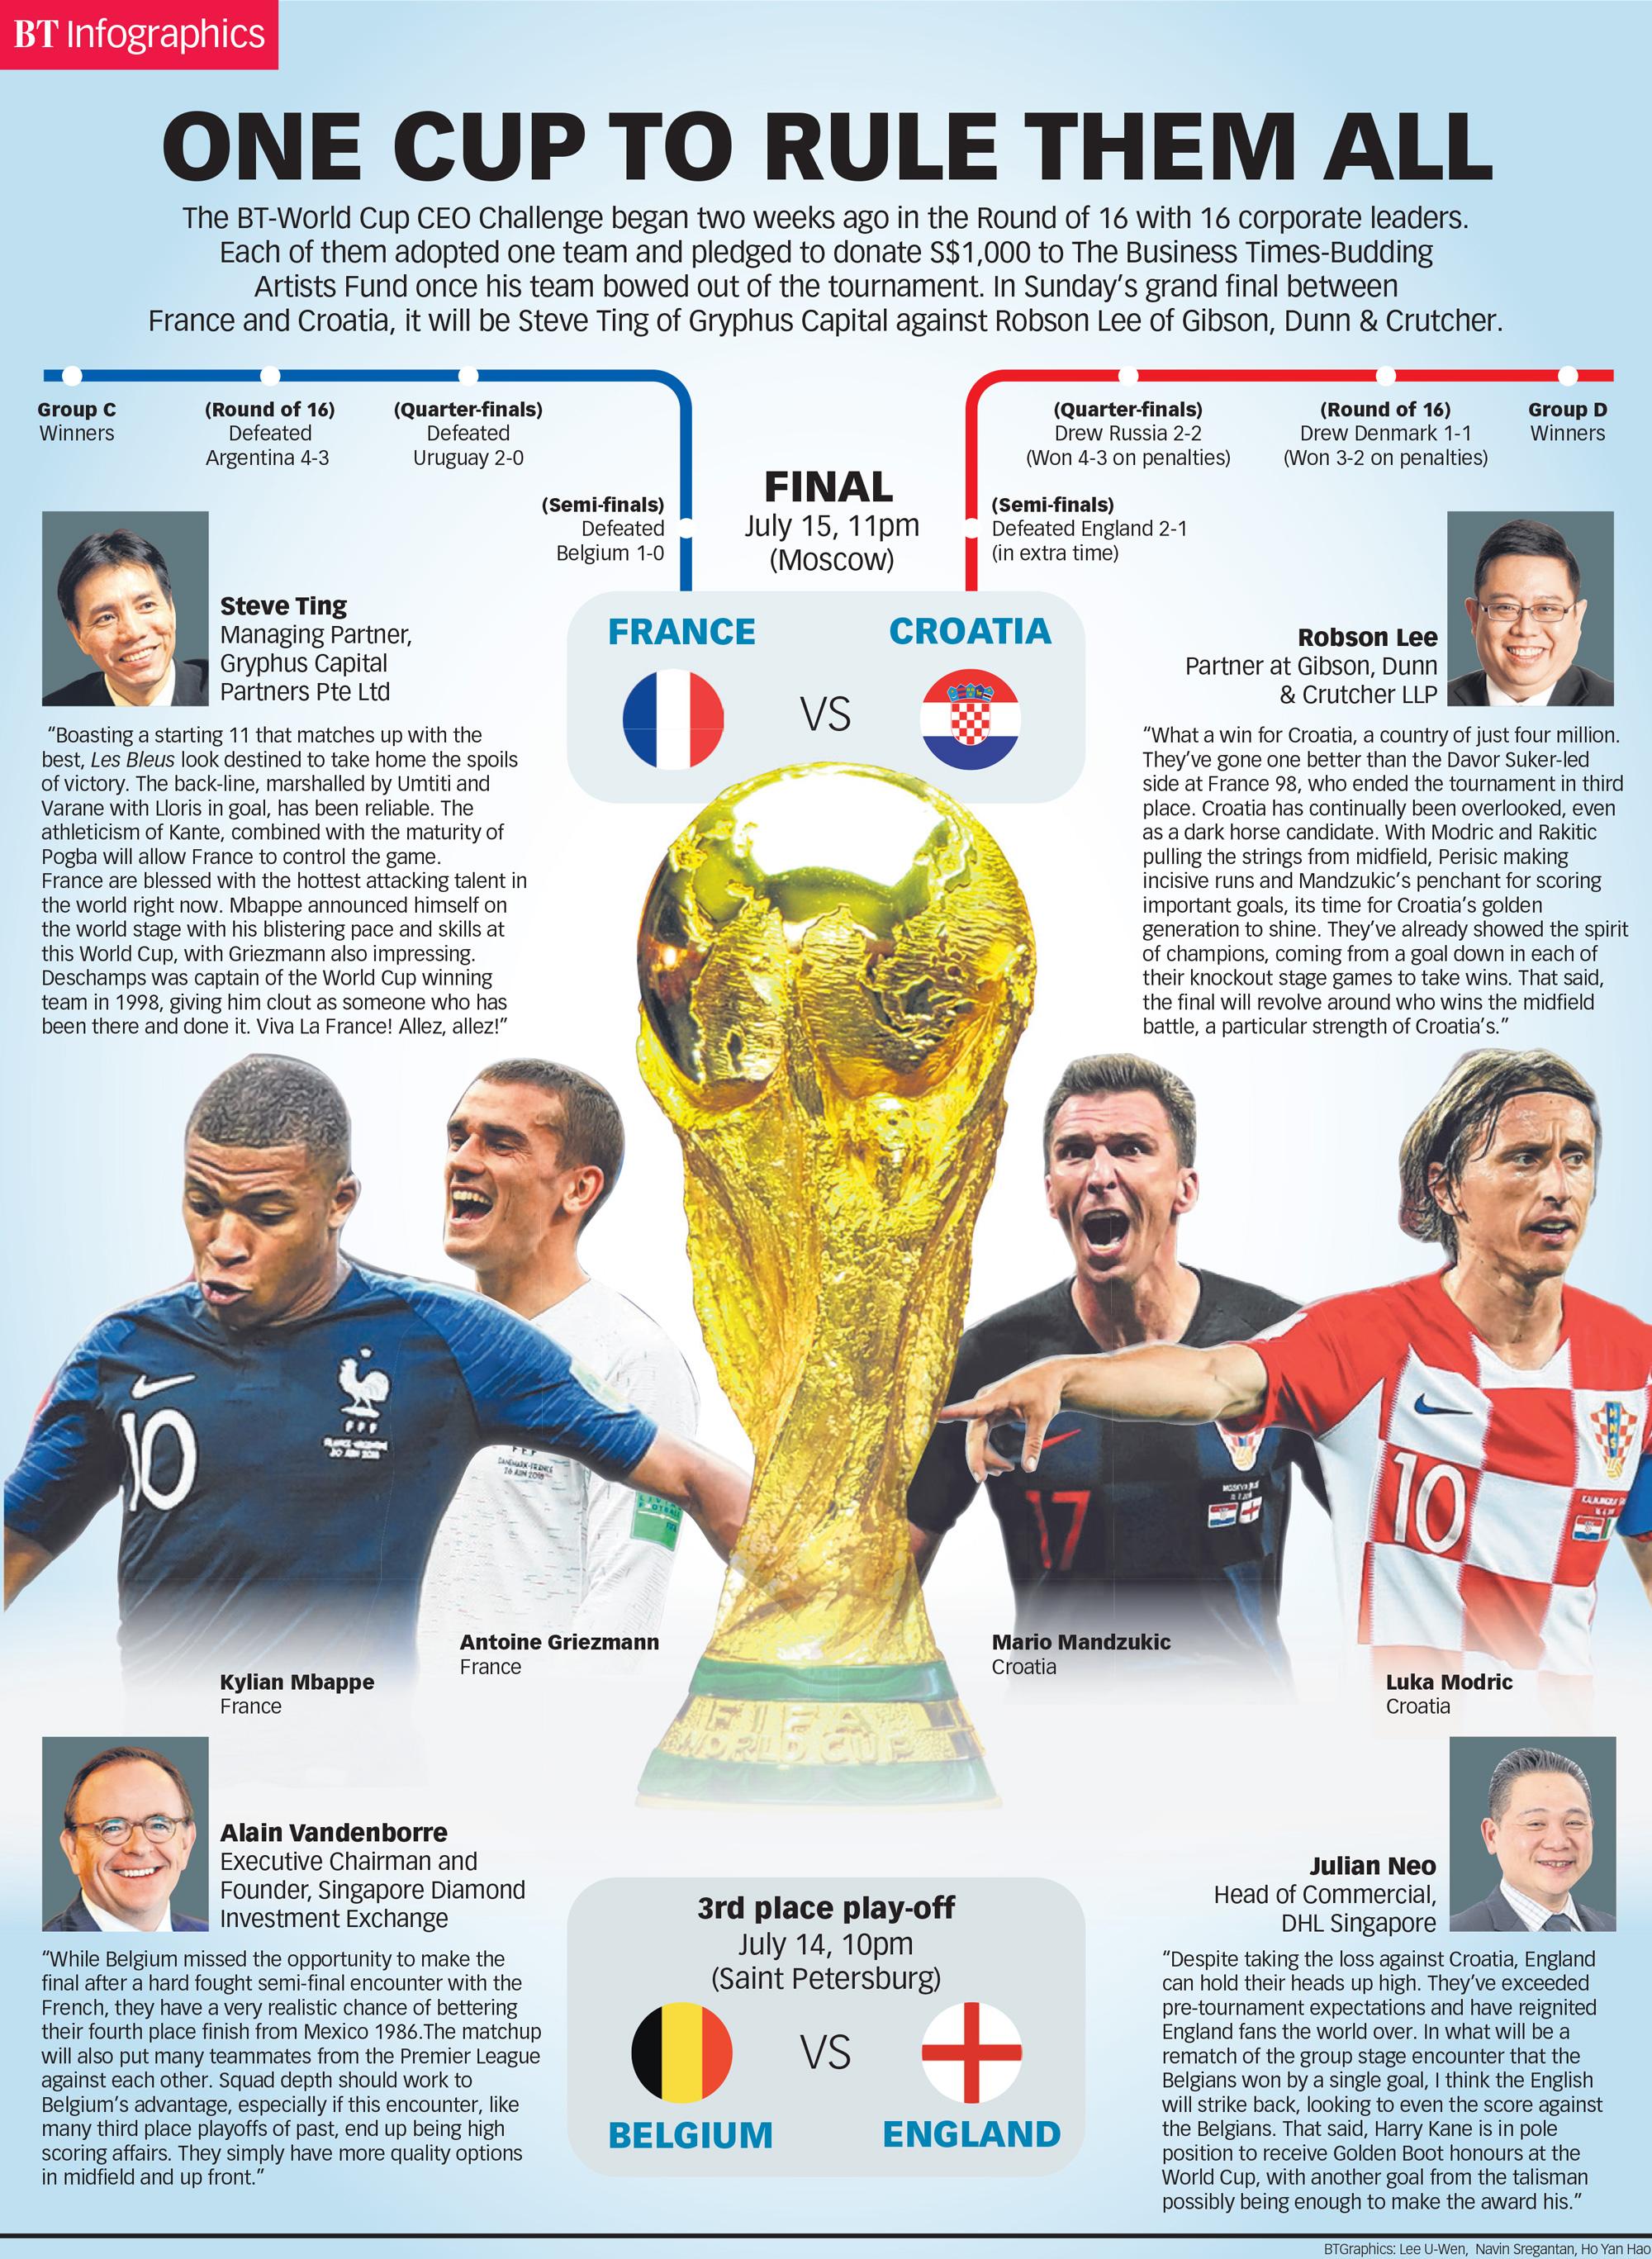 July-14-Worldcup-roadmap-CEO_02.jpg